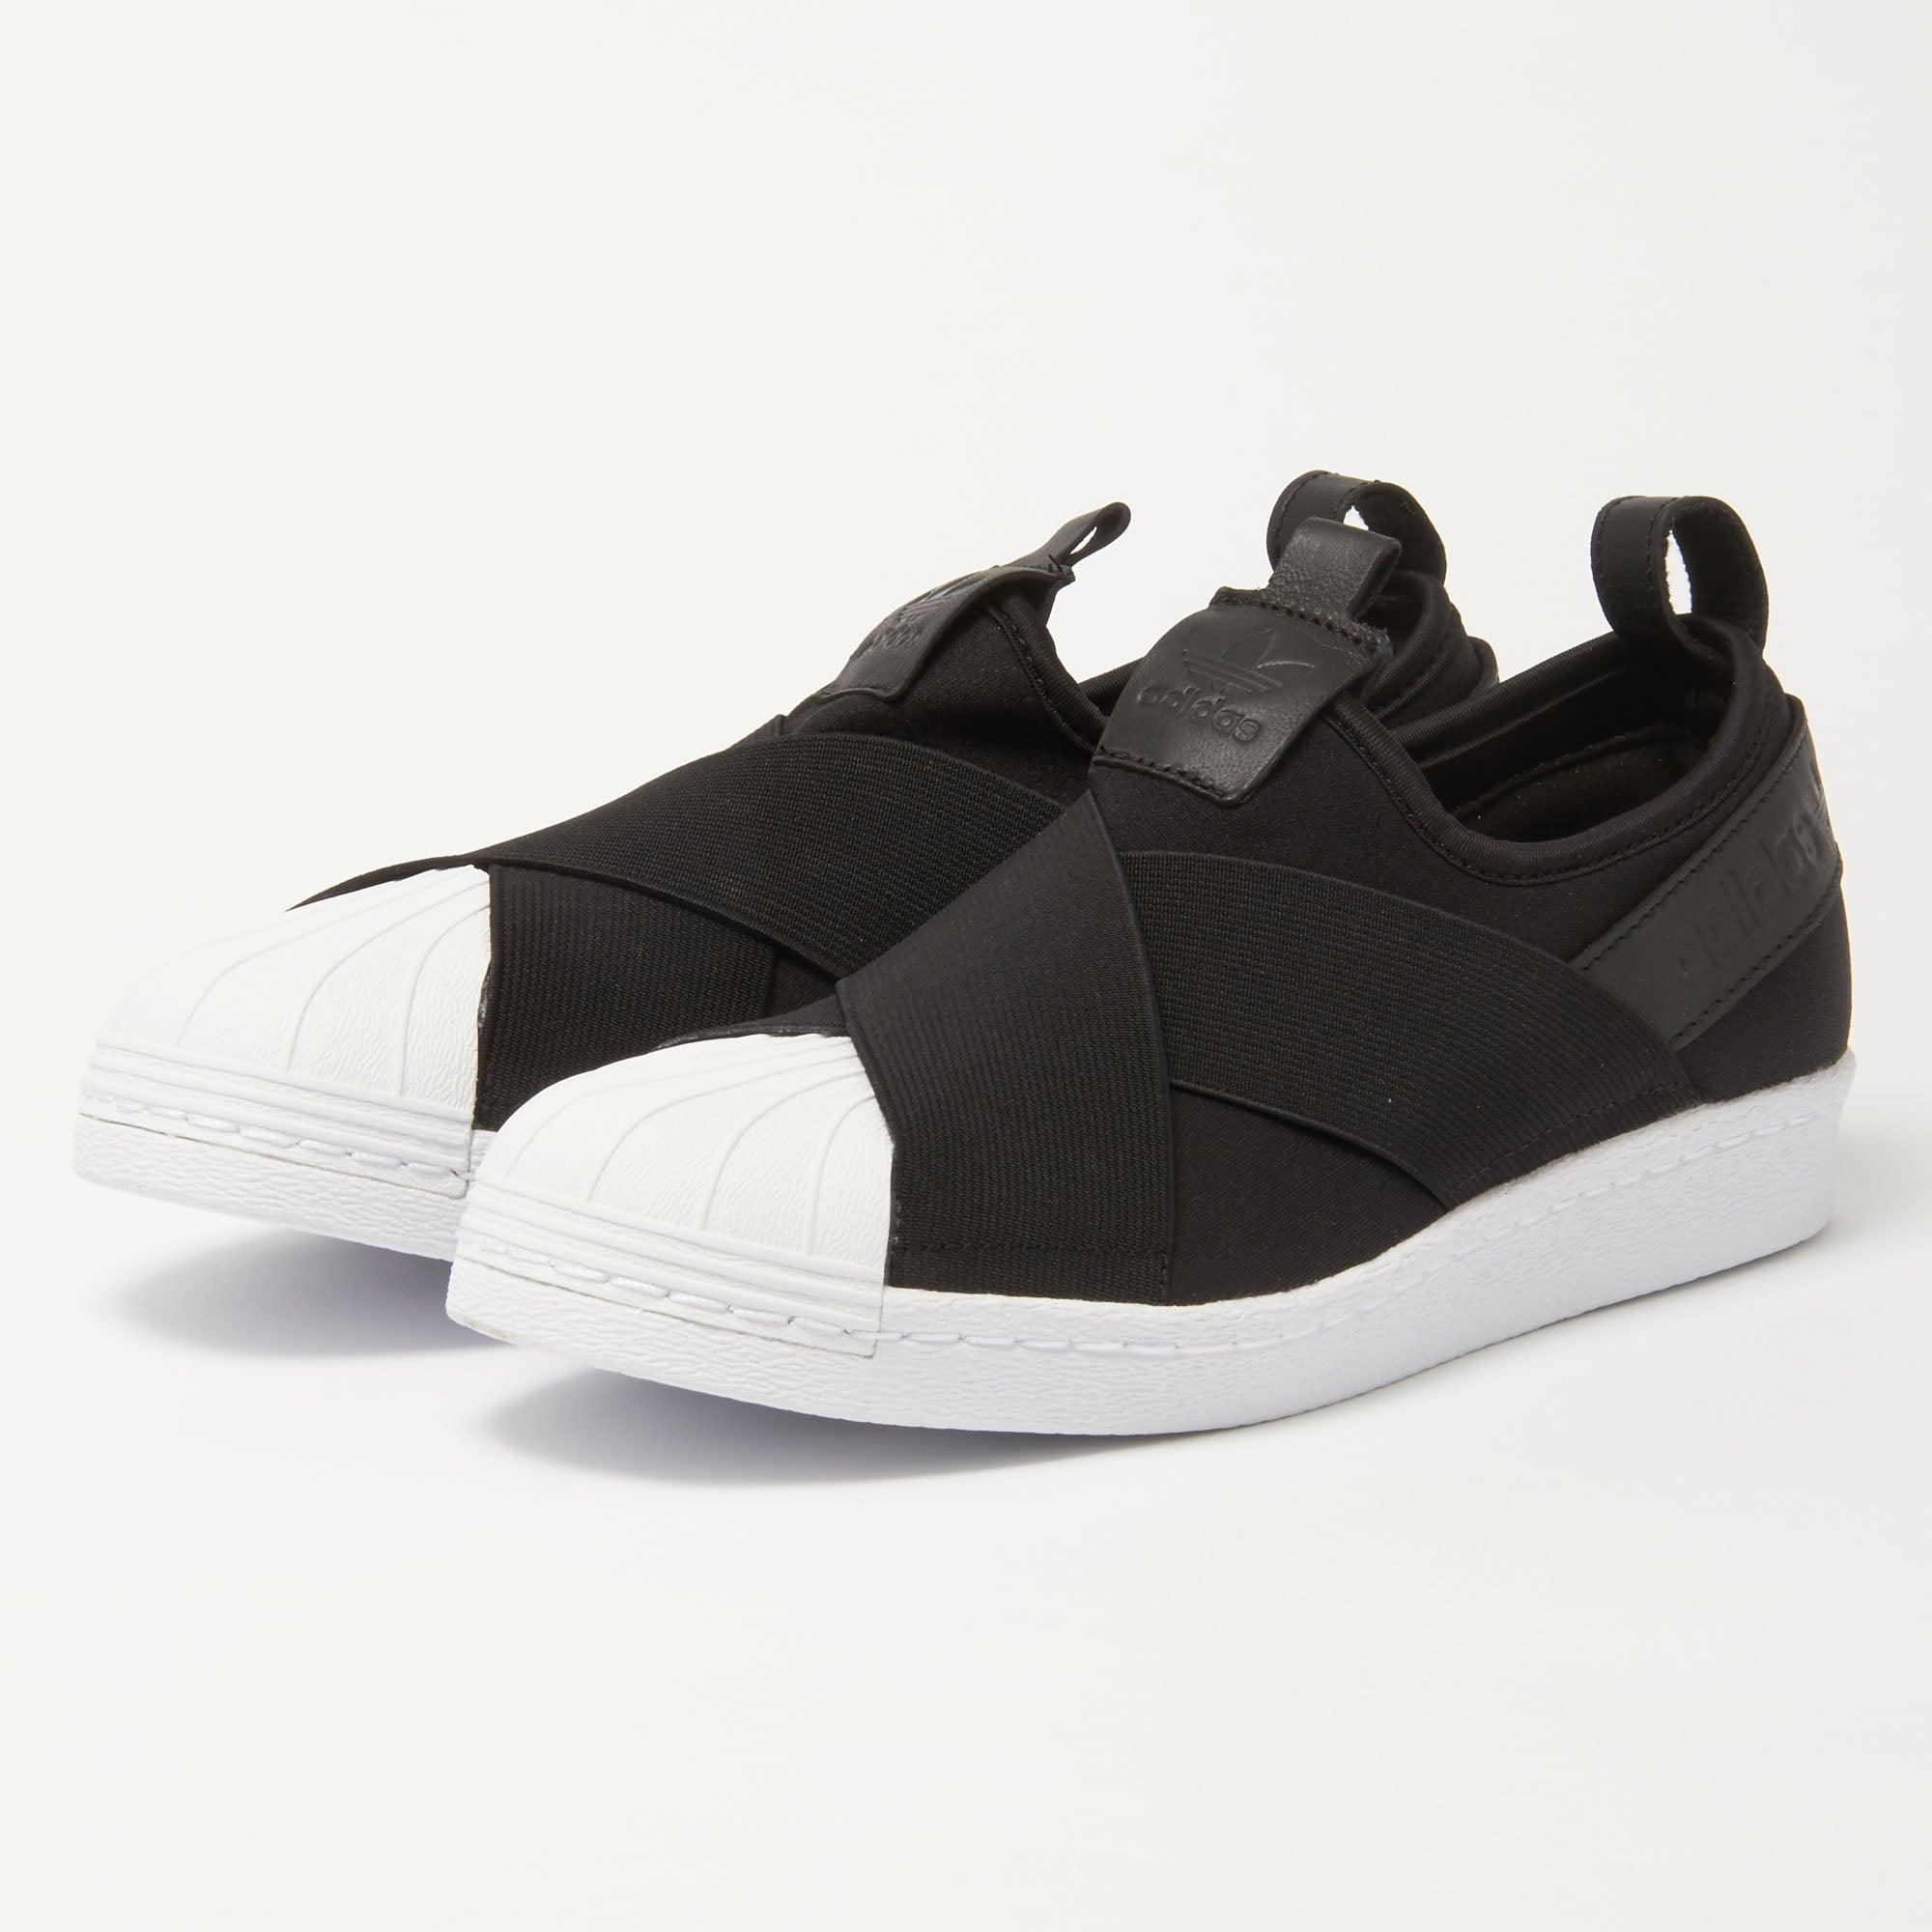 Adidas Superstar Slipon (Nero) Bz0112 Dandy Compagni